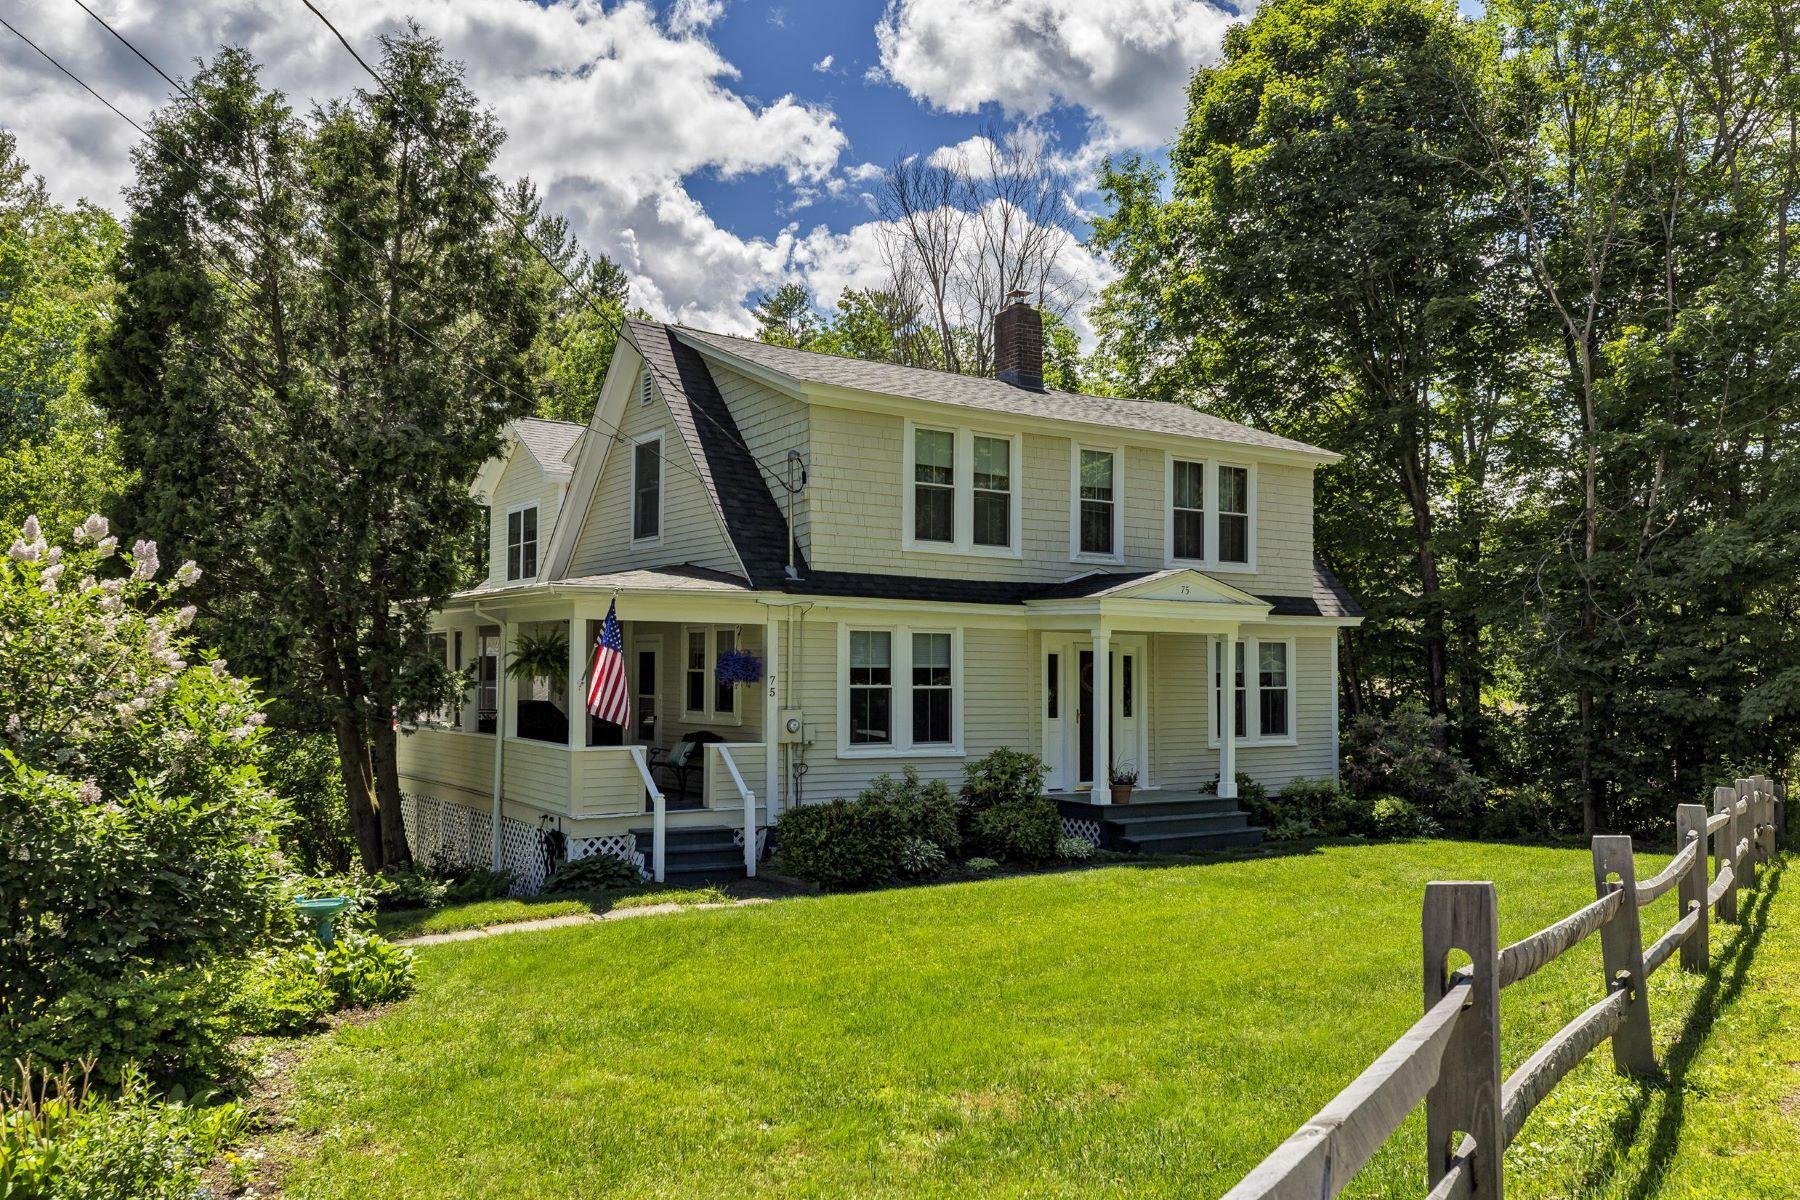 Single Family Homes для того Продажа на Completely Renovated Home Close to Town 75 Parkside Rd, New London, Нью-Гэмпшир 03257 Соединенные Штаты